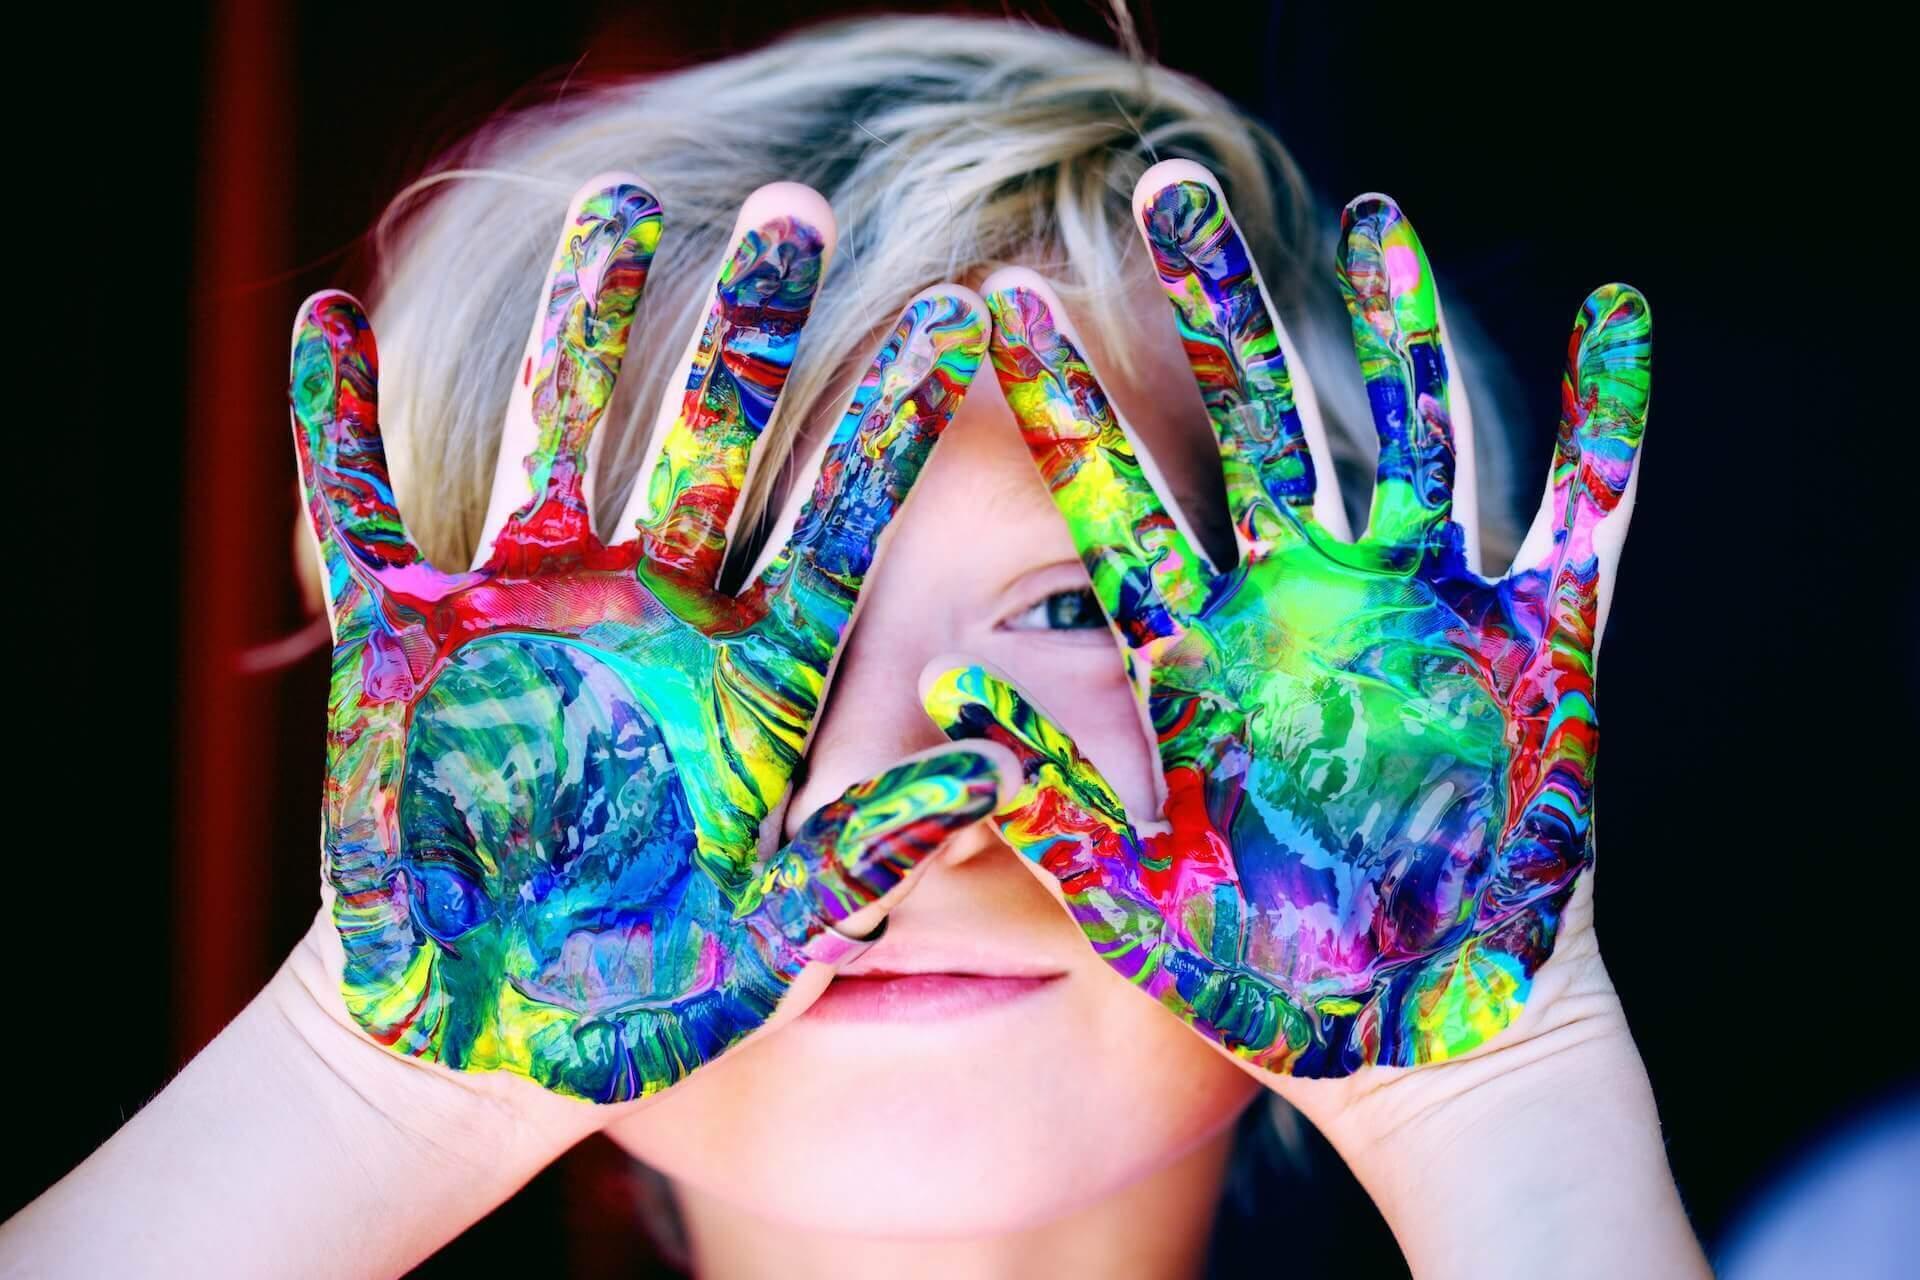 Parents Who Yell | Parenting | Children | Shouting | Freelance Writer | Australia | Tasmania | Lea Farrow | Writer | Writing | Copywriter | Copywriting | Online | Website Copy | Web Copy | Feature Articles | Feature Writing | Blog Posts | Blogging | Newspaper | Magazine | Publication | Technical Writing | Reviews | Real Estate Copy | SEO